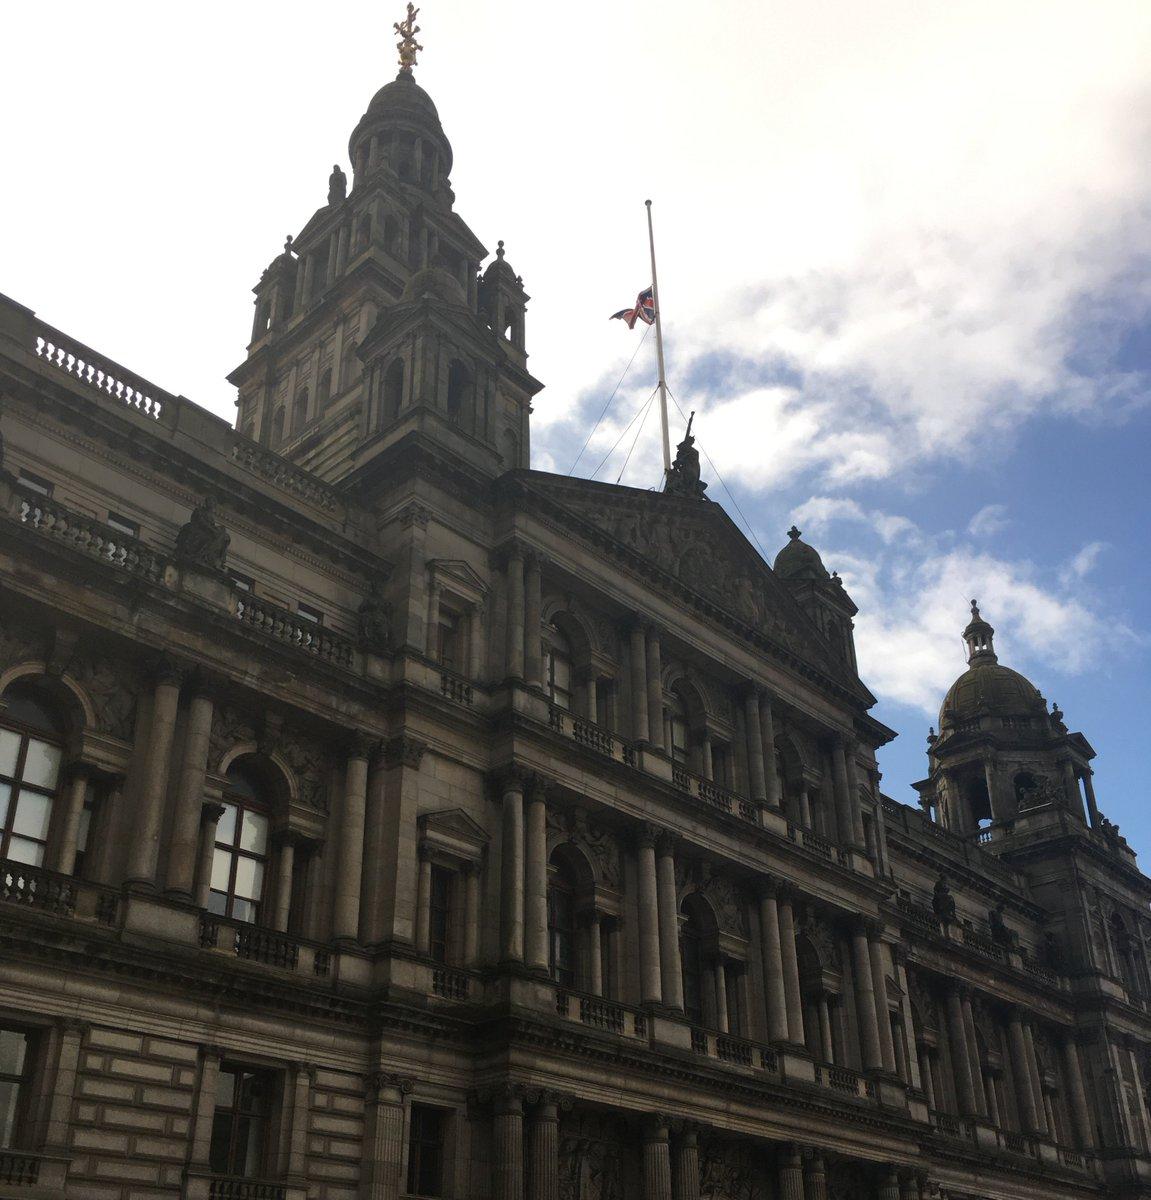 RT @GlasgowCC: Glasgow Sends Heartfelt Sympathies to the People of Manchester https://t.co/A3pP6QJ1ld https://t.co/eYX0k4qKkN